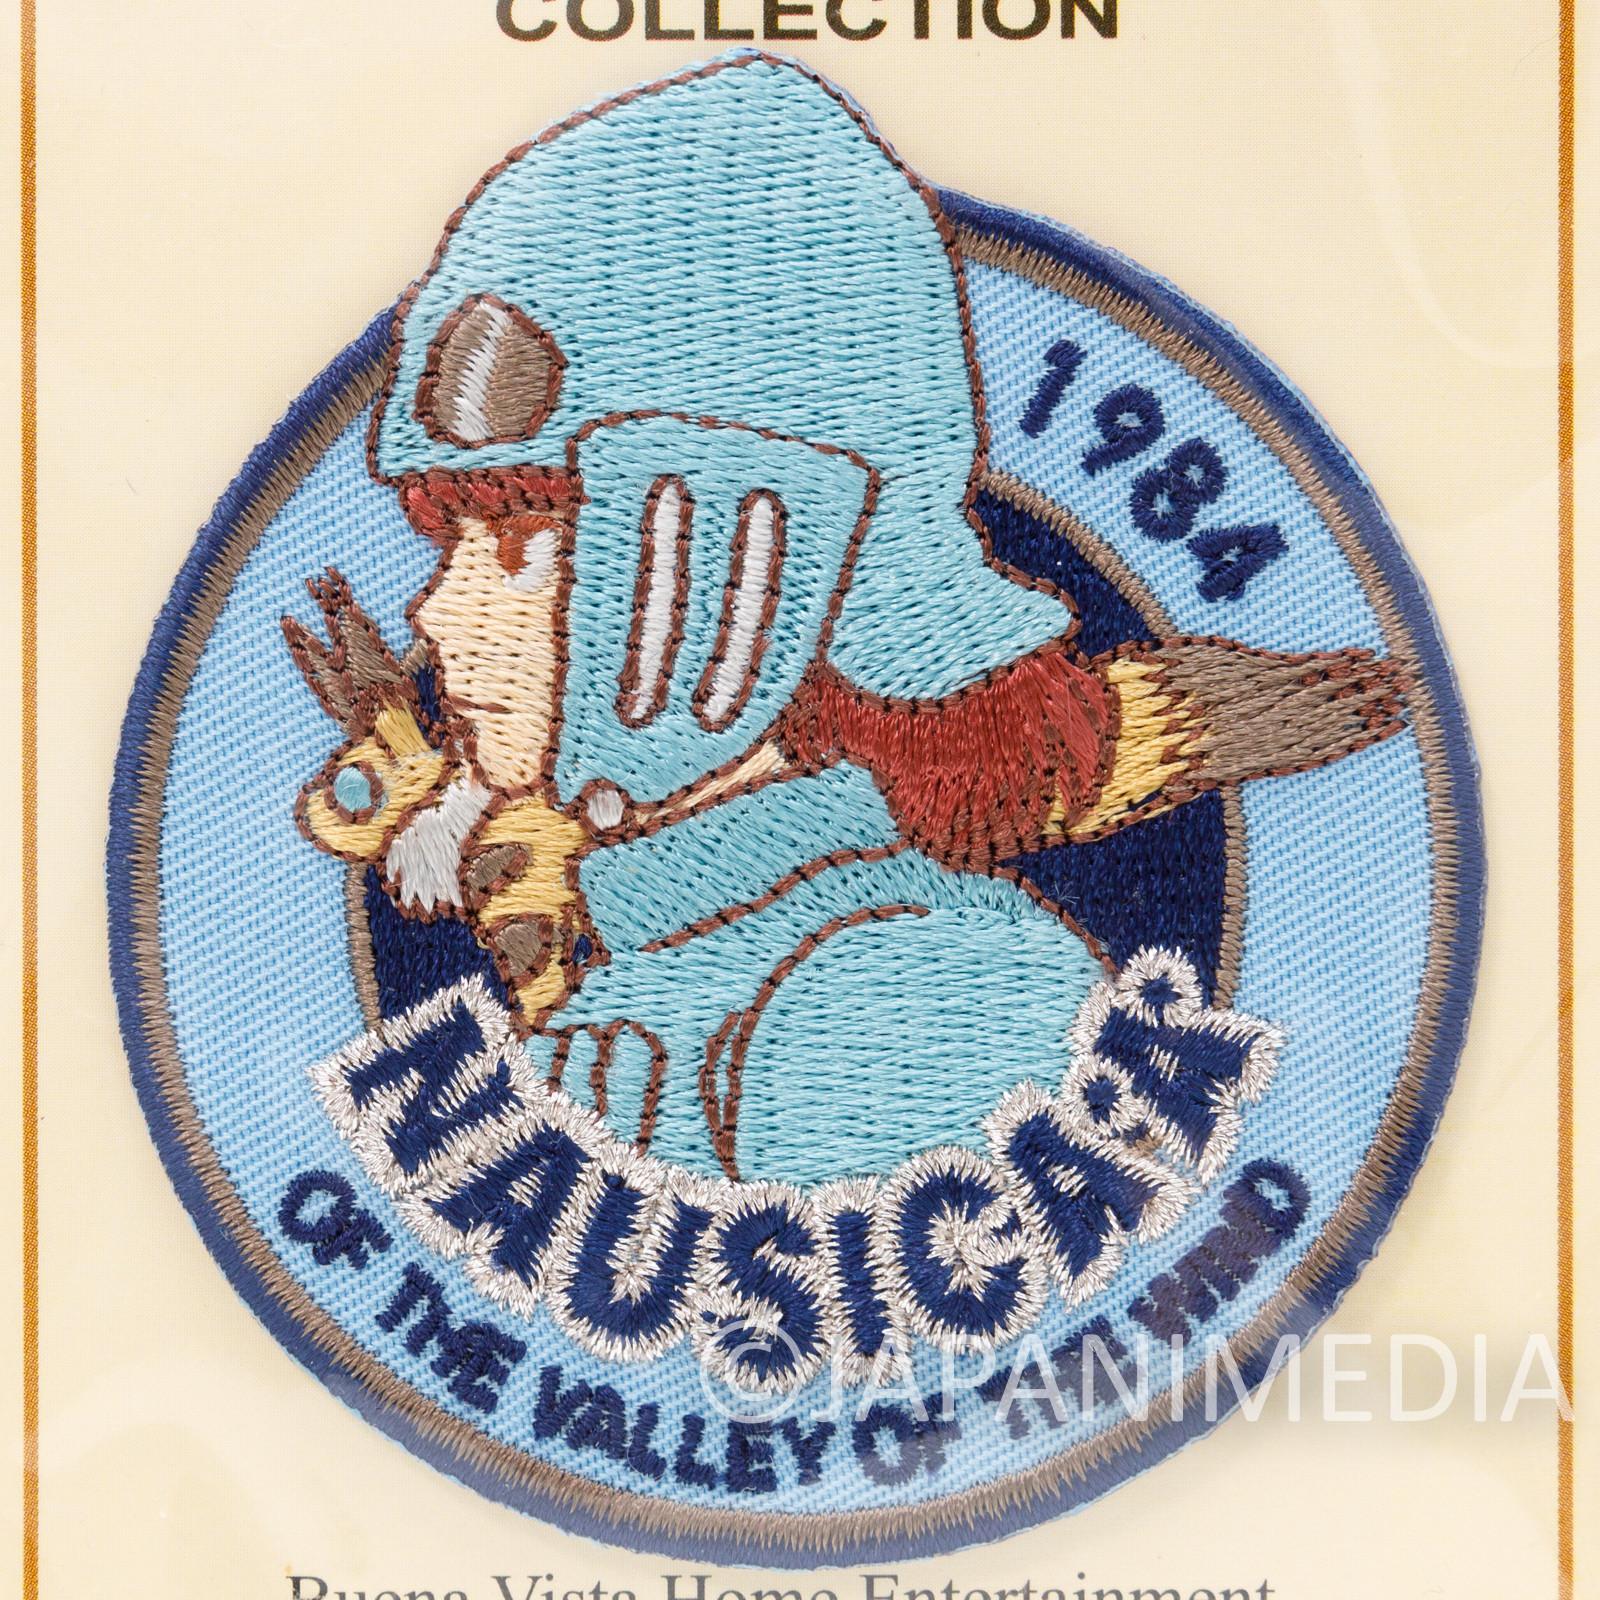 Nausicaa of the Valley Emblem Badge Wappen Ghibli JAPAN ANIME